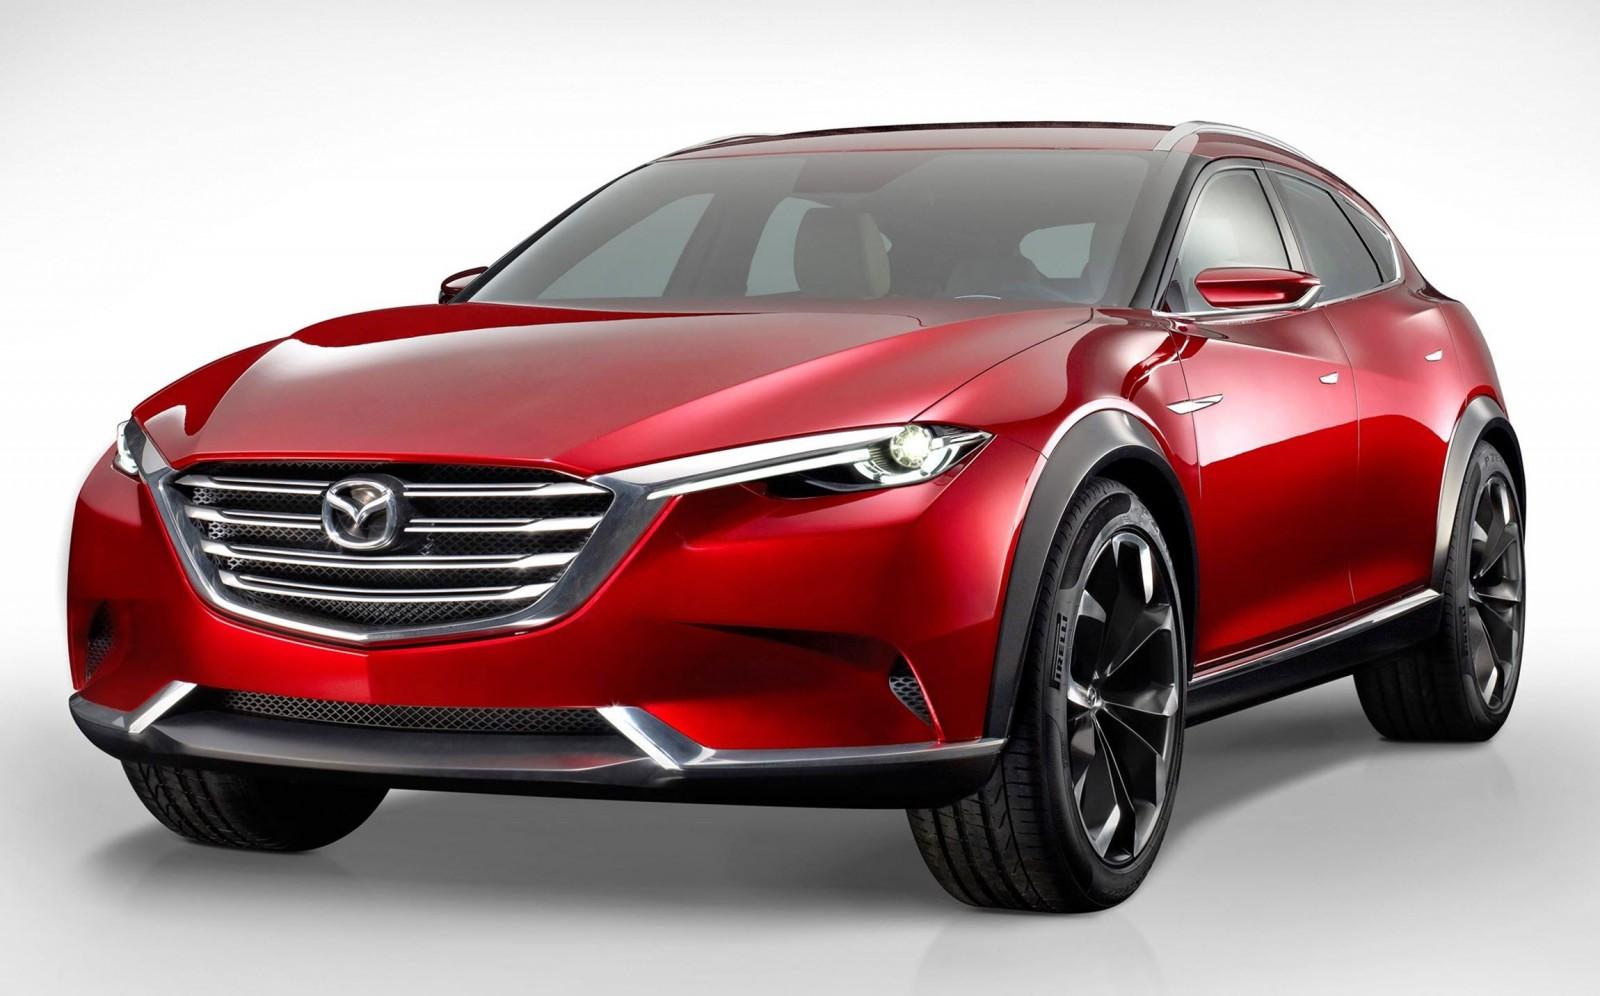 2015 Mazda KOERU Concept - 216.7KB